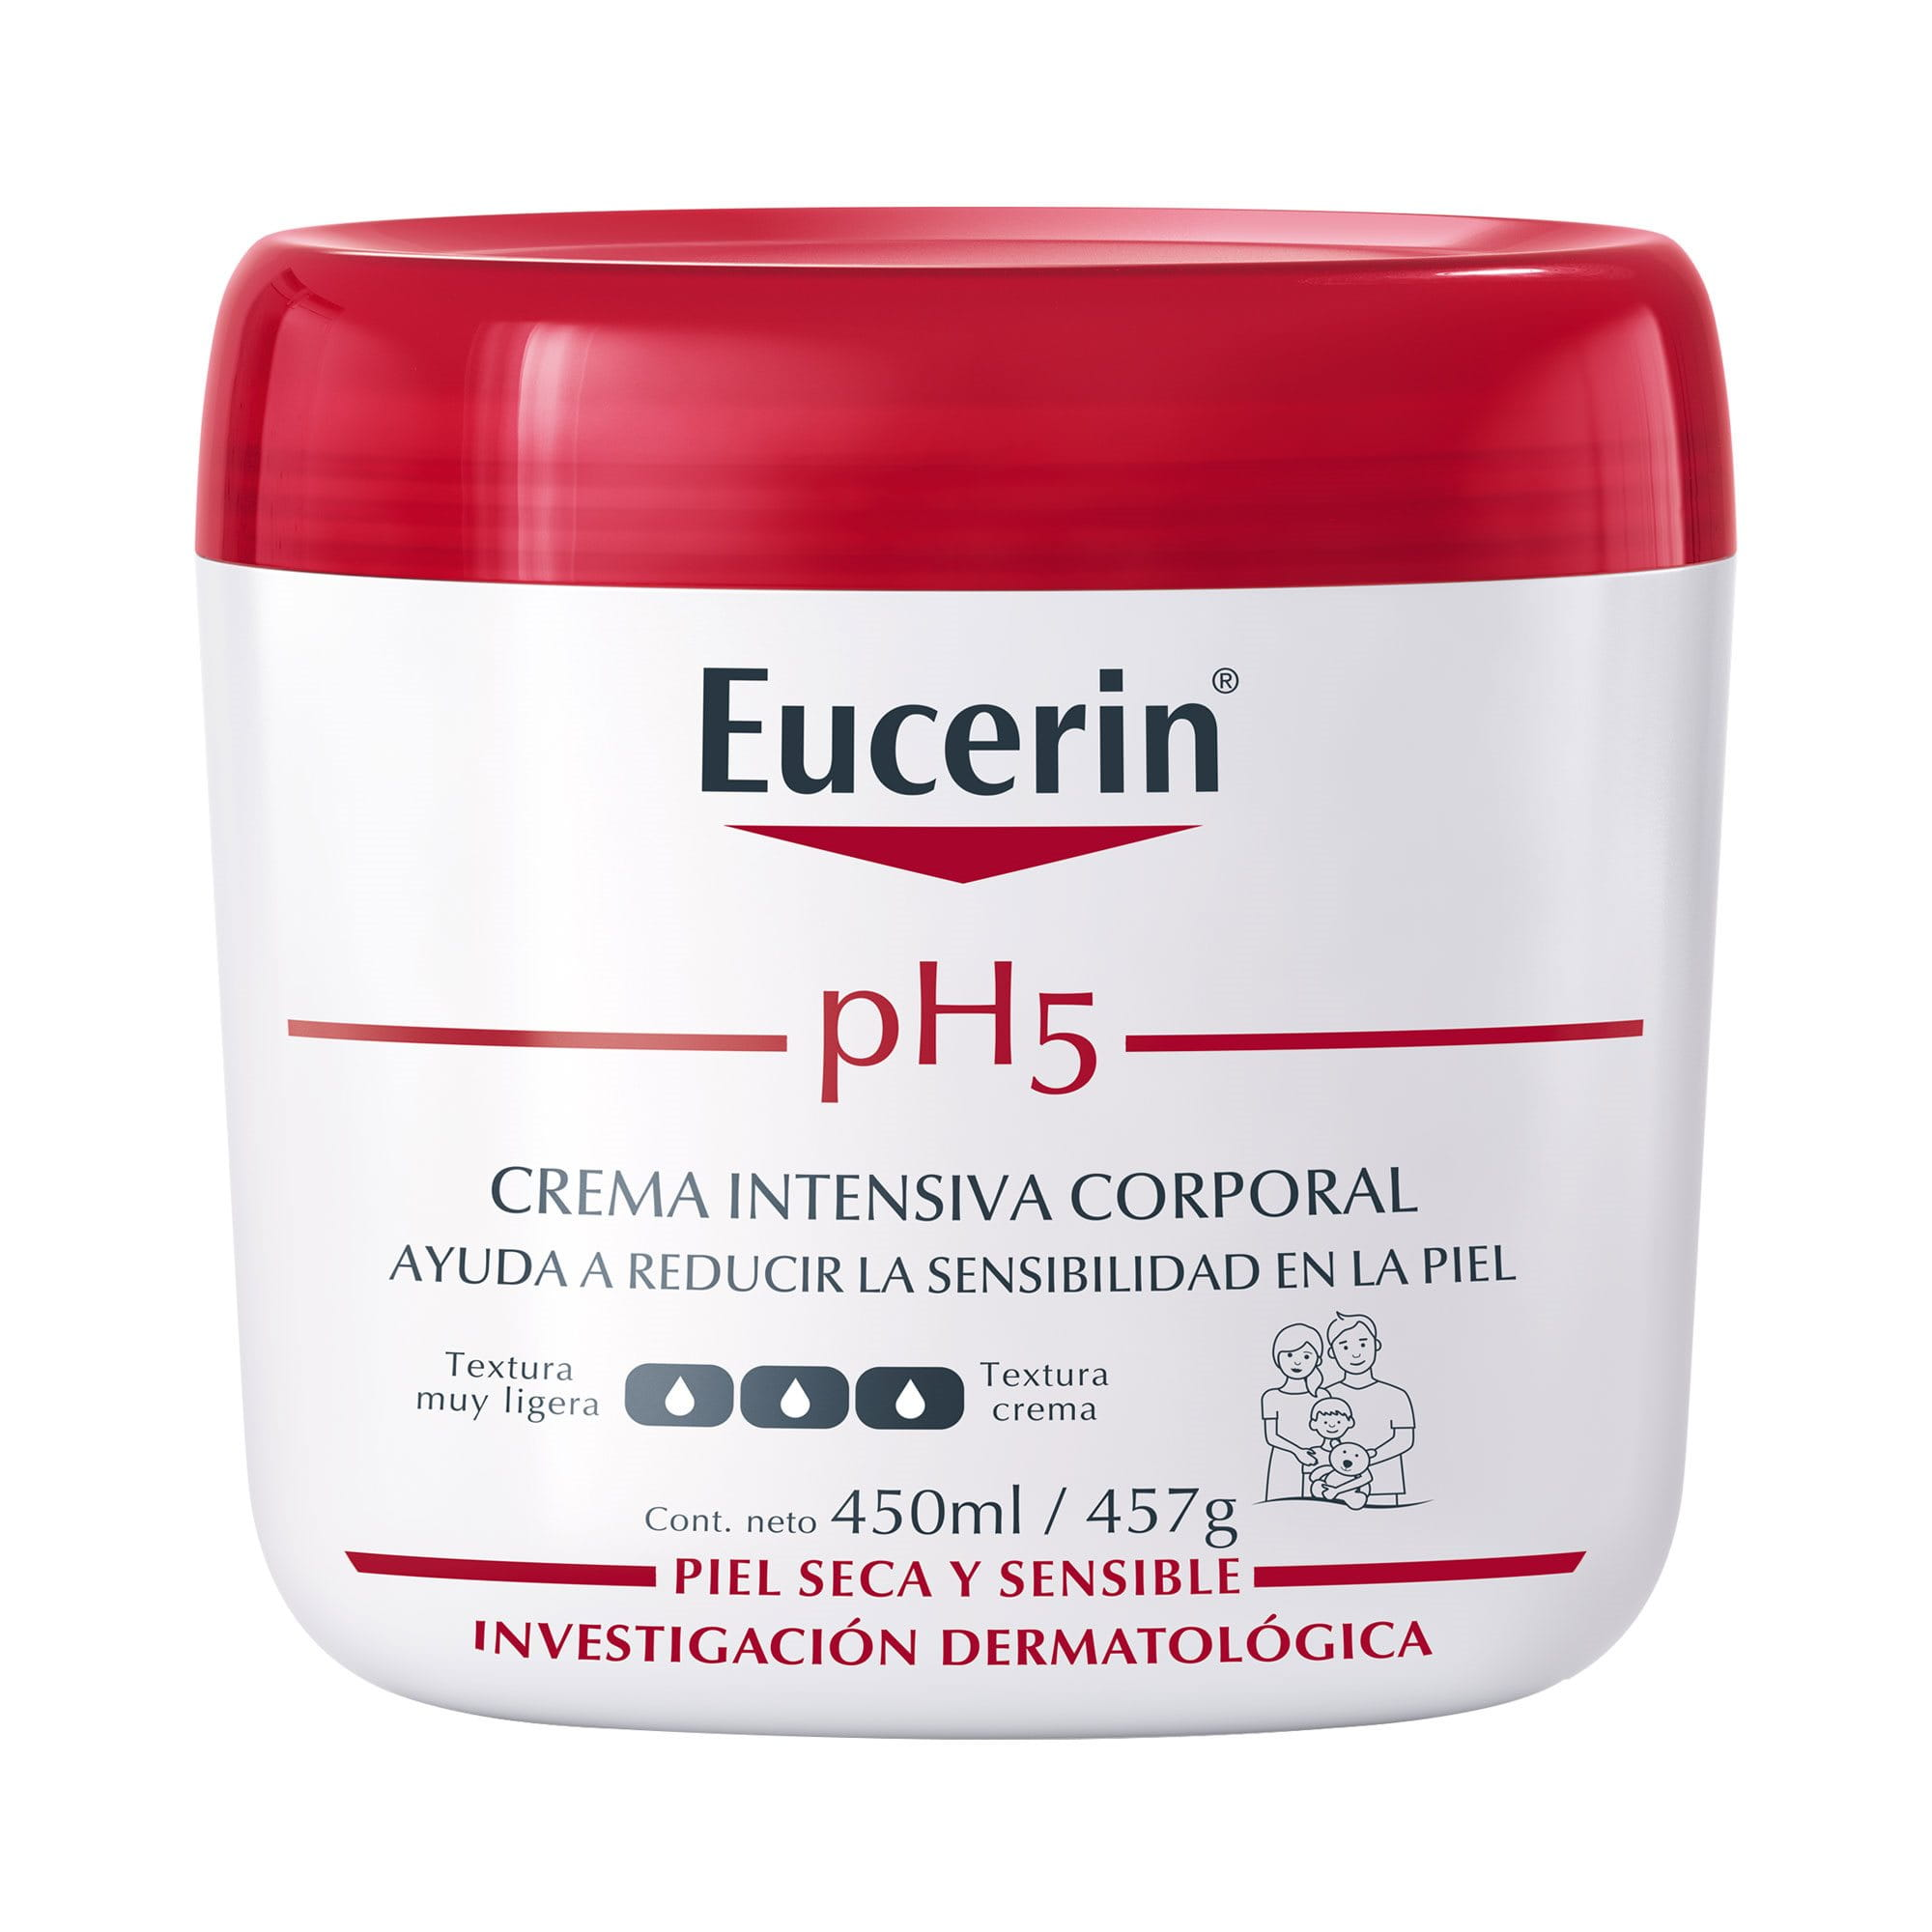 88782_Eucerin-PH5-Crema-intensiva_packshot